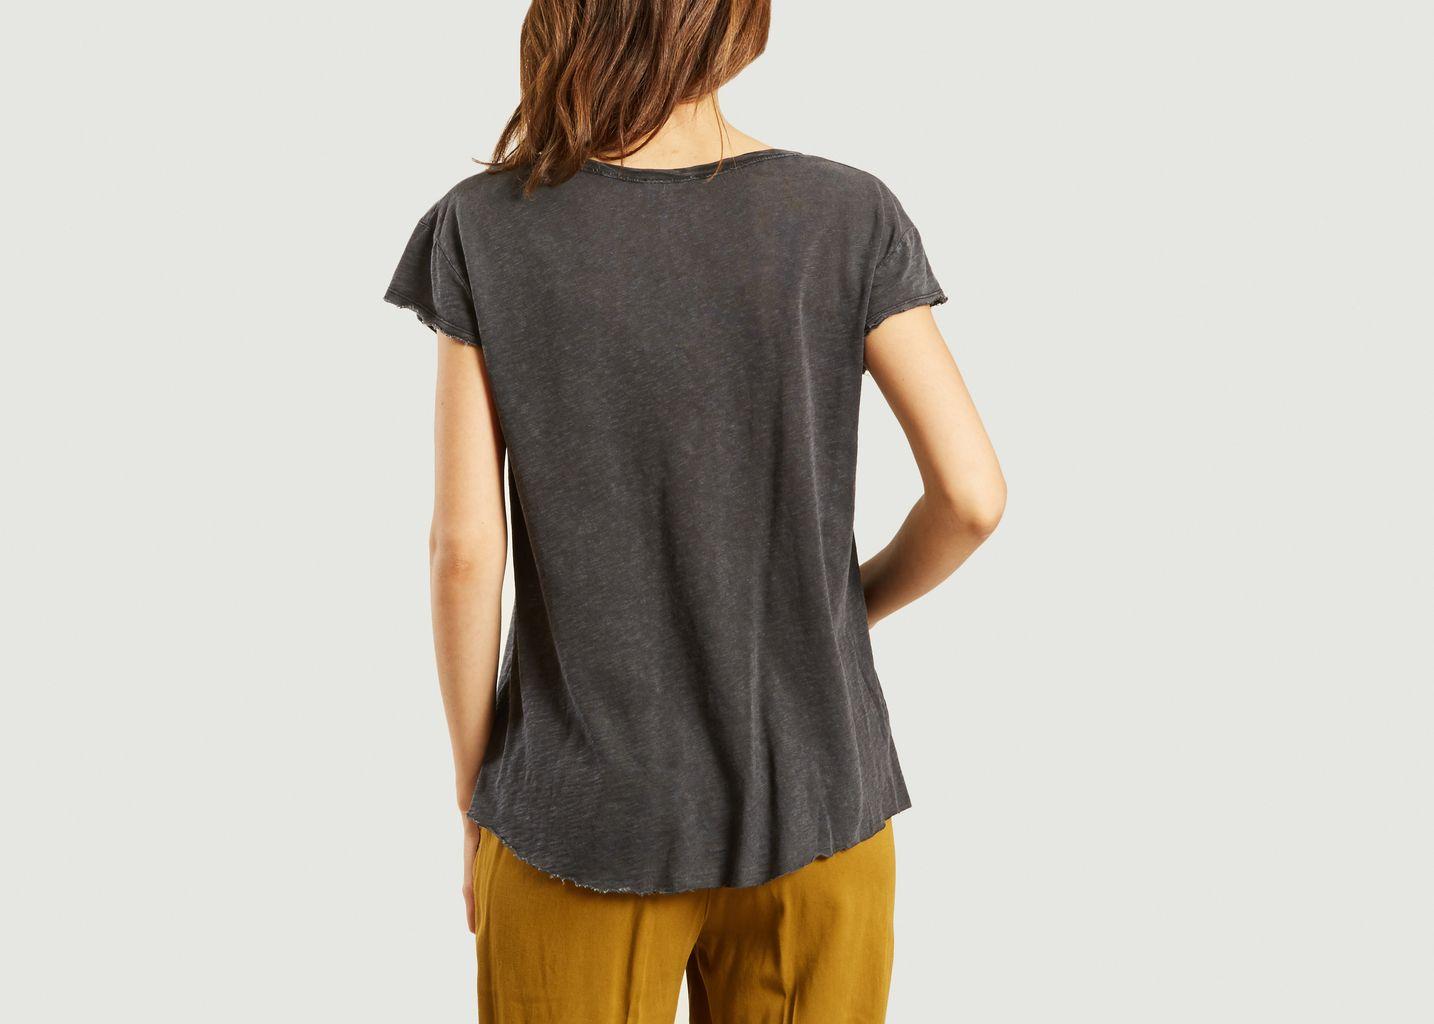 c416b5bc3f3df T-Shirt Lorkford Anthracite American Vintage   L Exception